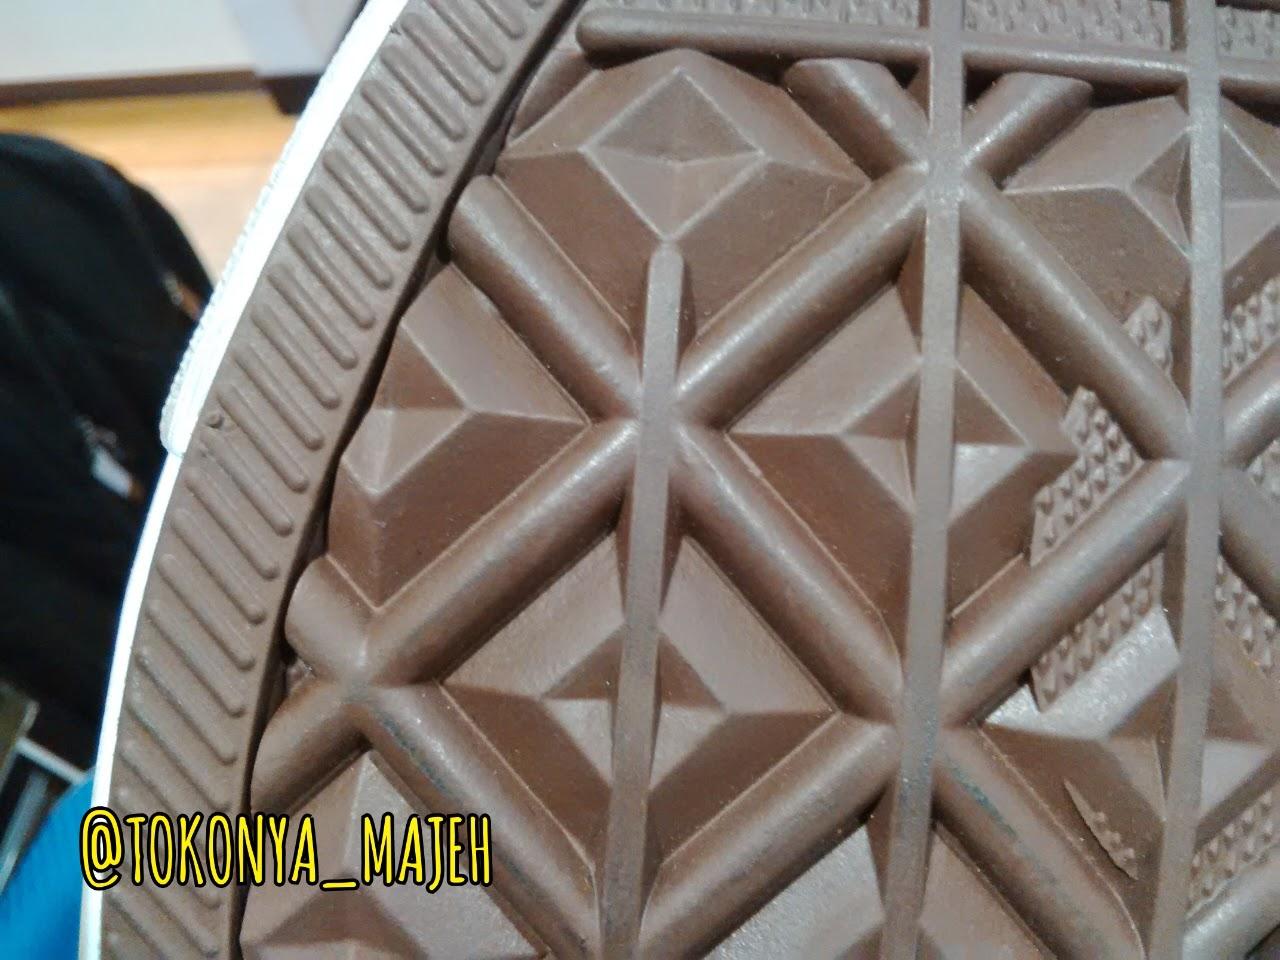 PUNYA MAJEH  Ciri-ciri Sepatu Converse Asli Original Made In ... 84dc0888ba